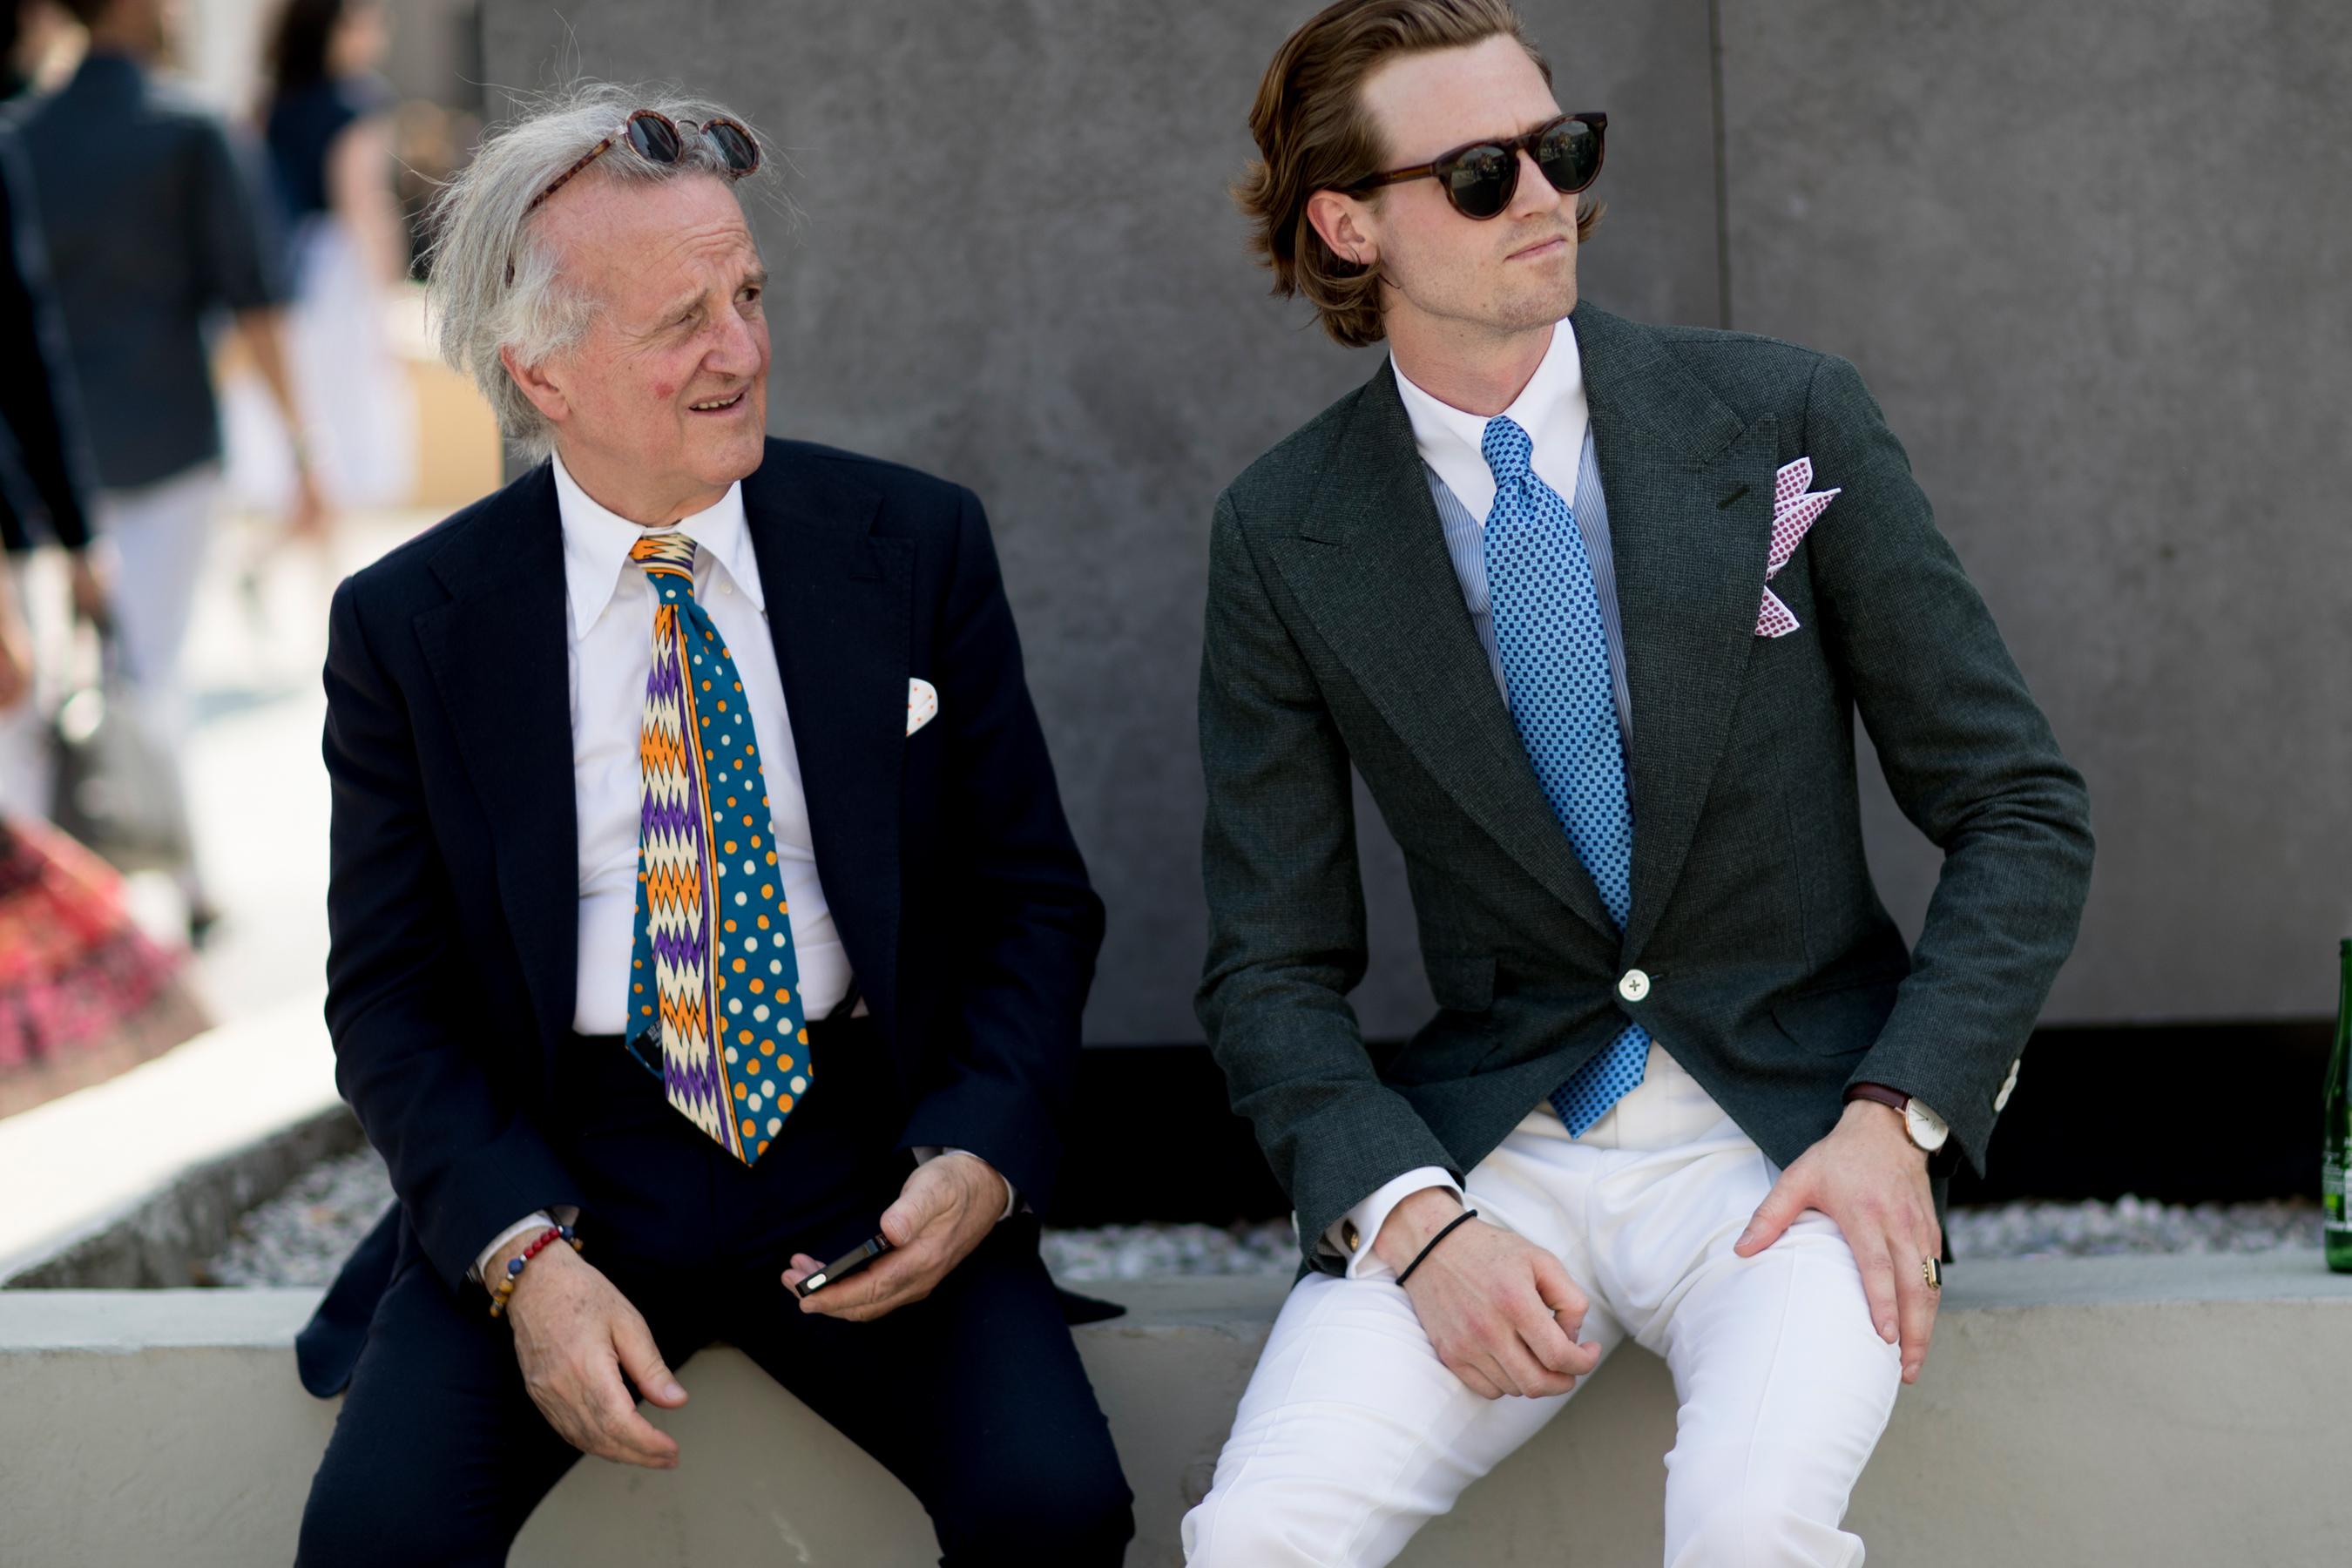 Firenze Pitti Uomo Fashion Week Men's Street Style Spring 2018 Day 2